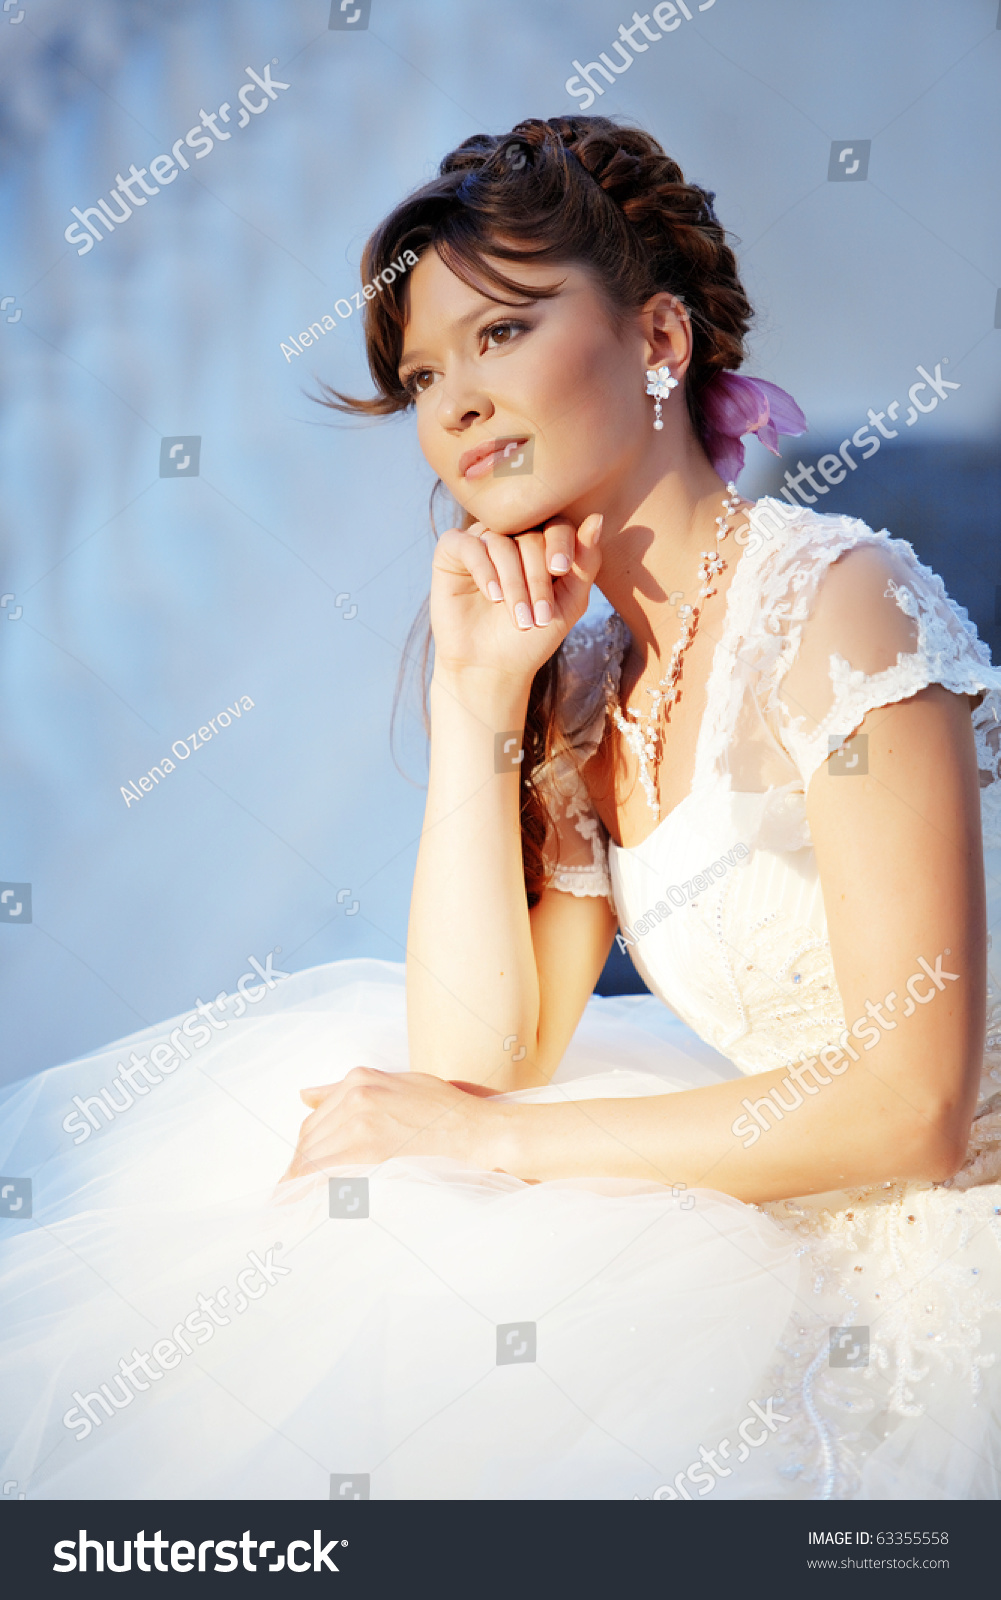 photo: Beautiful Bride 1792382 Search Stock